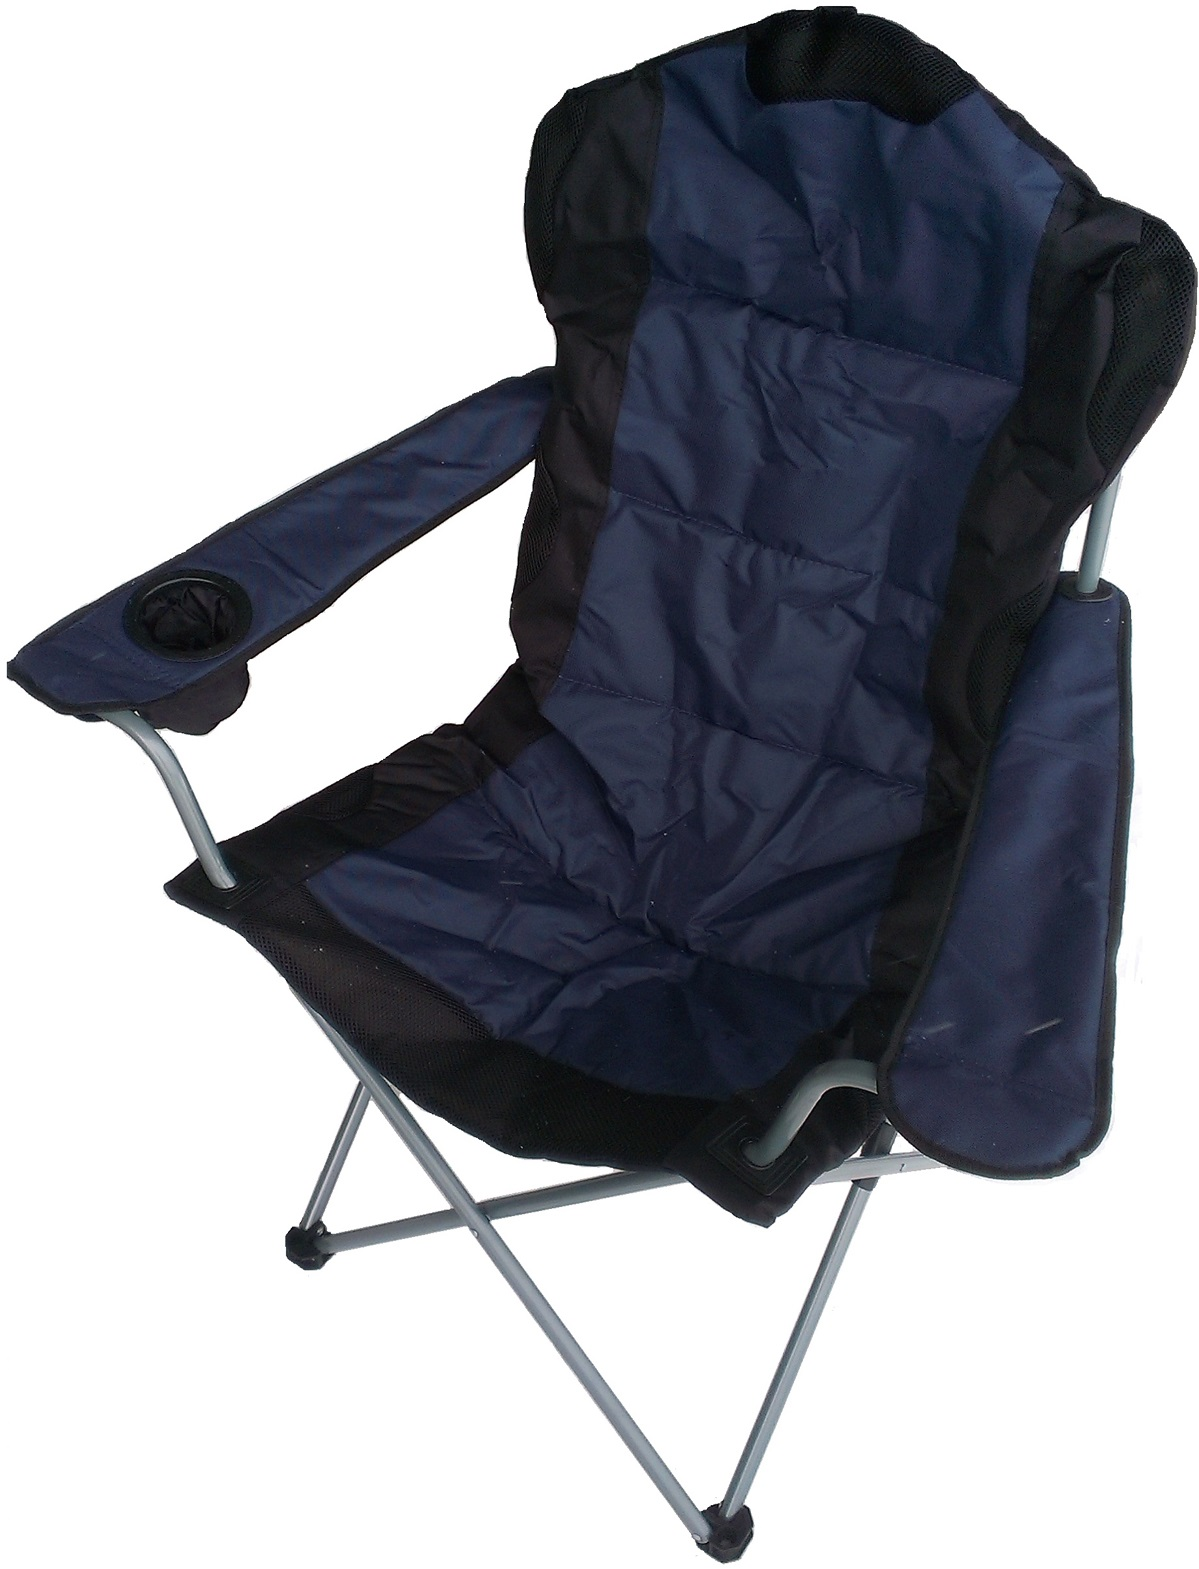 Green Glade (М2305) - складное кресло (Blue/Black) от iCover